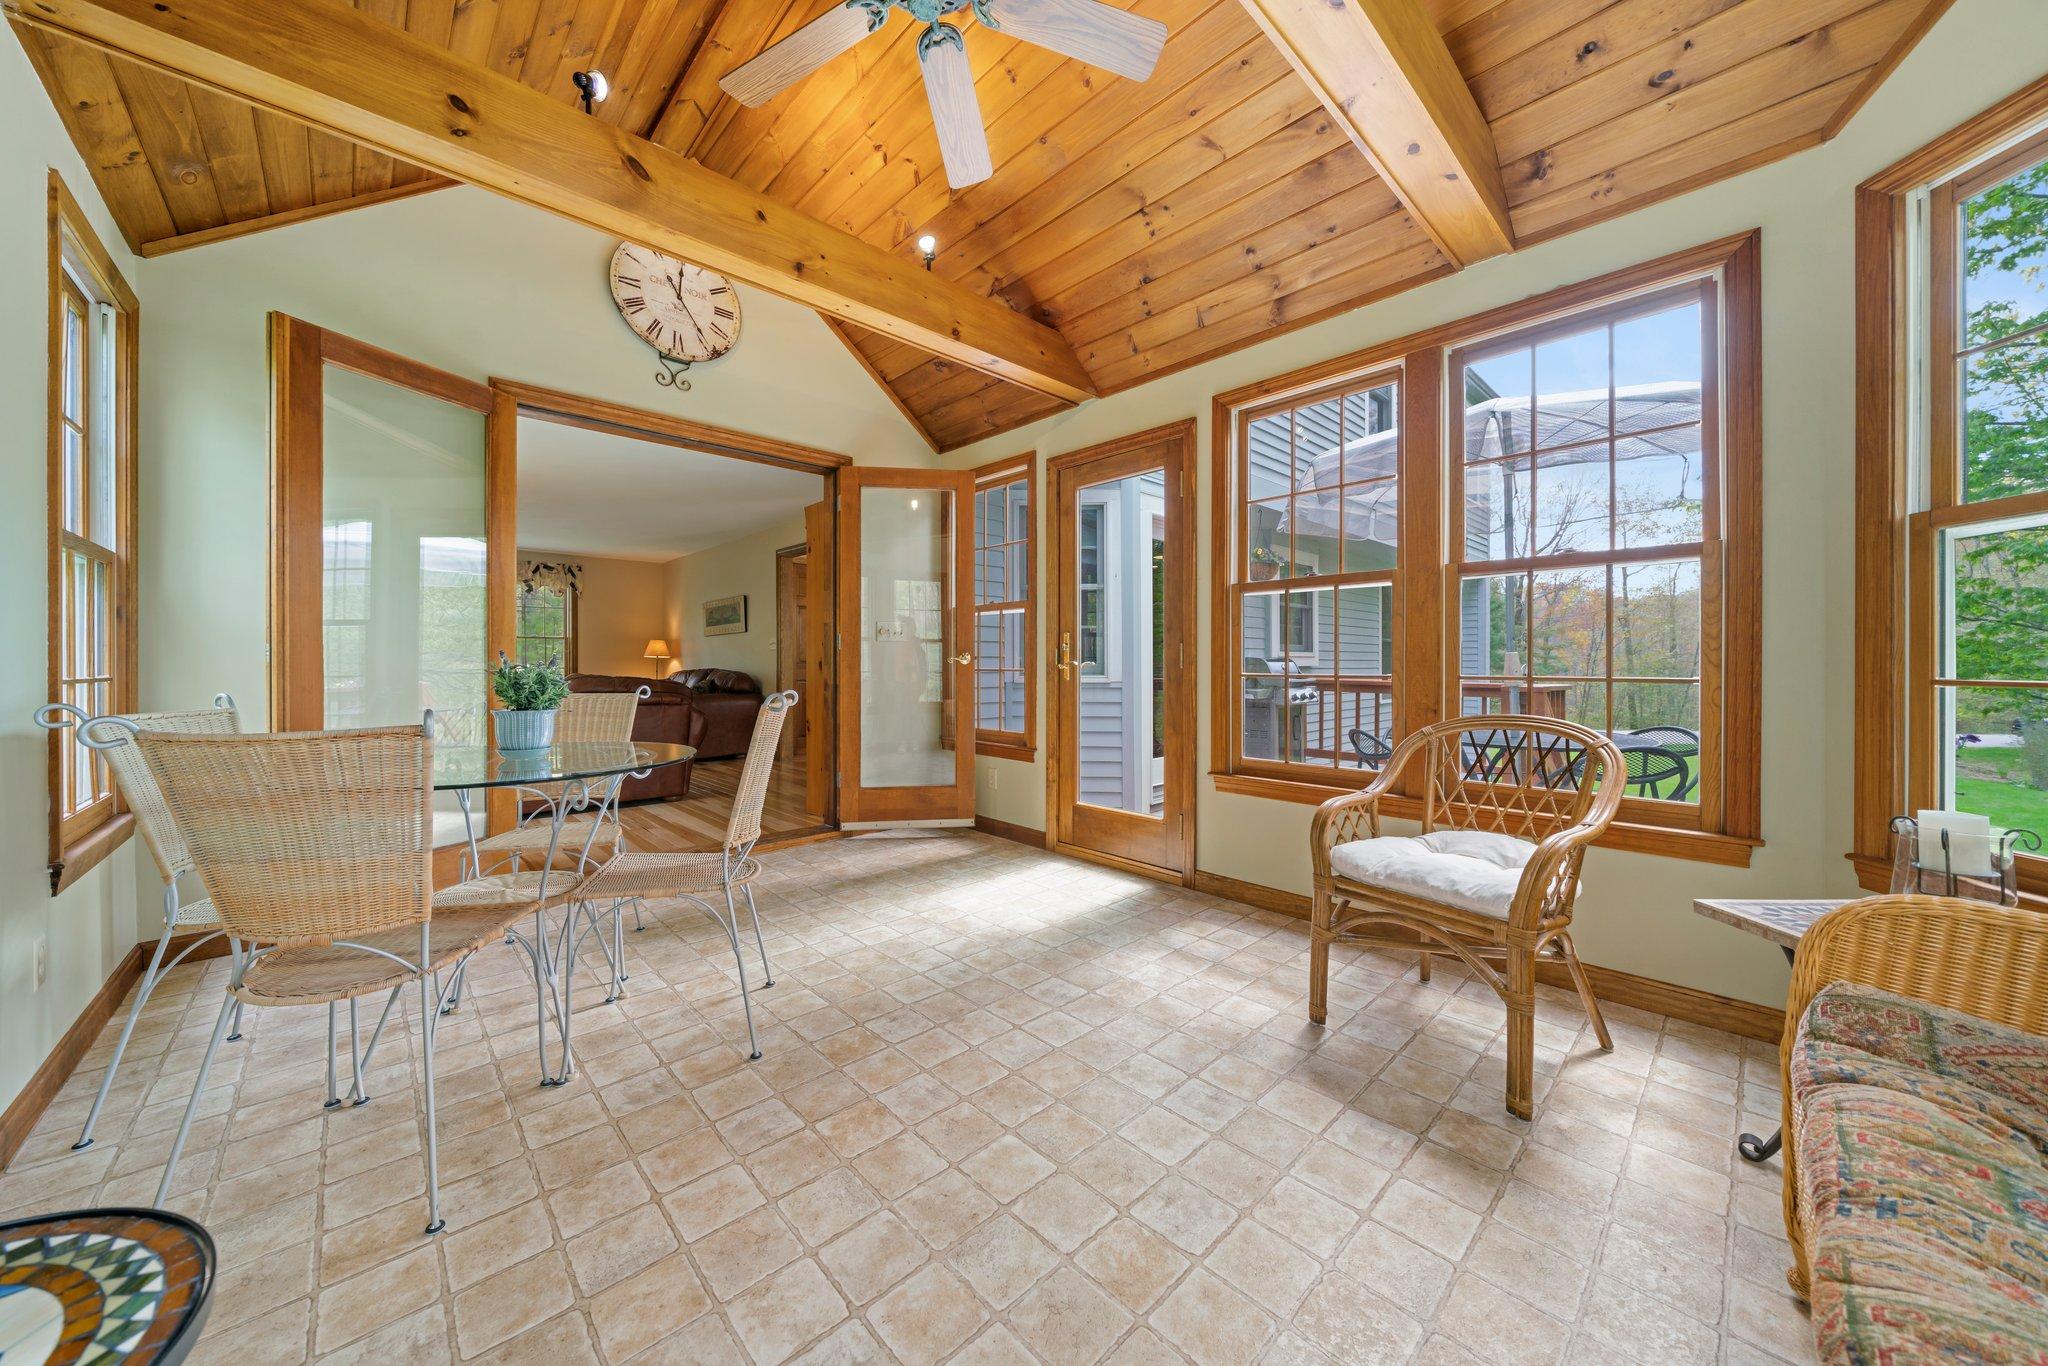 3-season porch - off living room